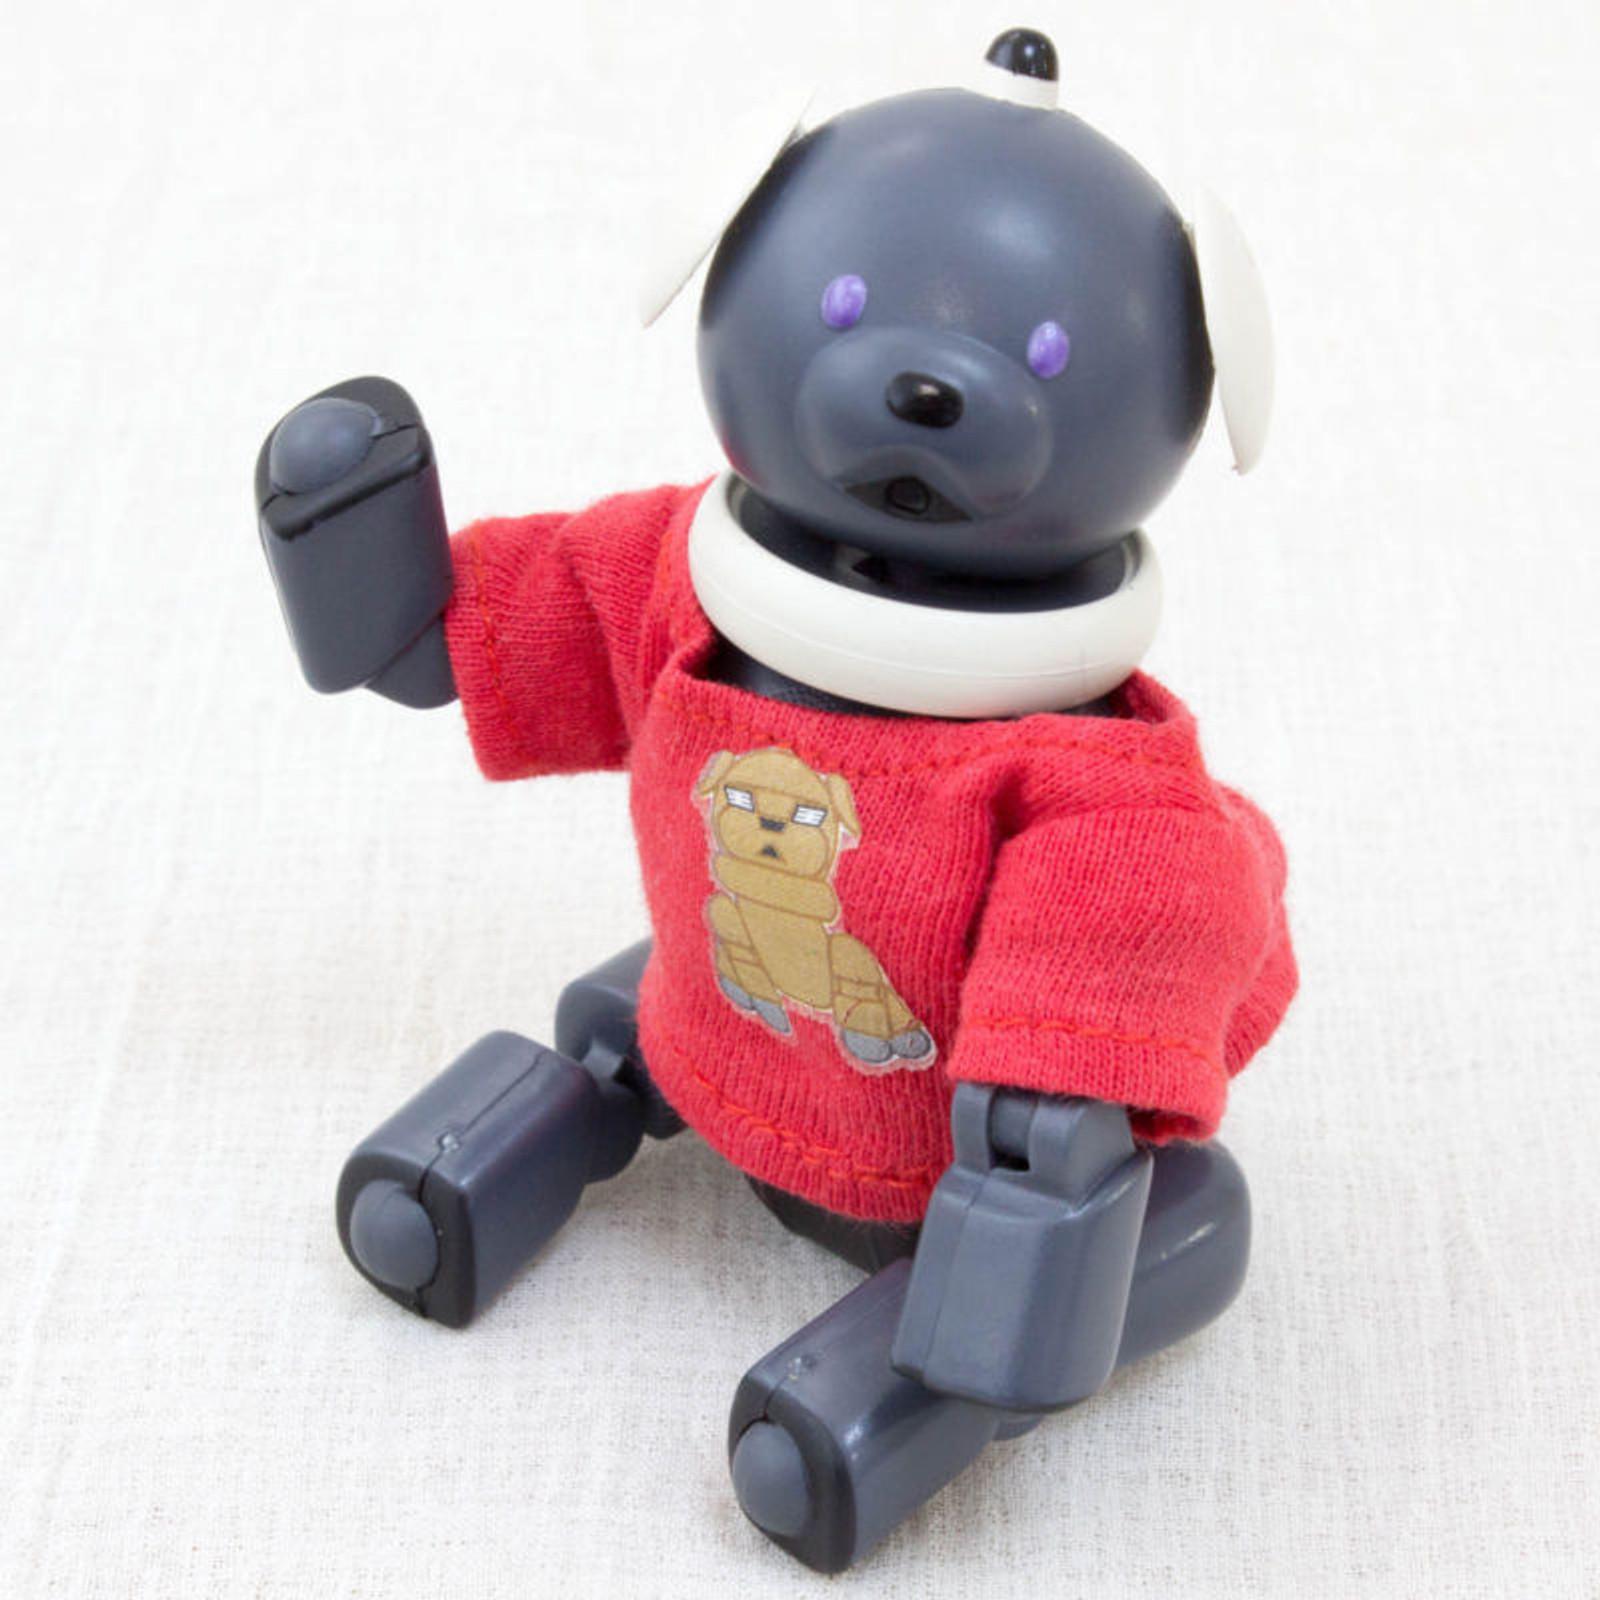 RARE! AIBO Macaron T-shirt Entertainment Robot 1/4 Scale Figure Medicom JAPAN